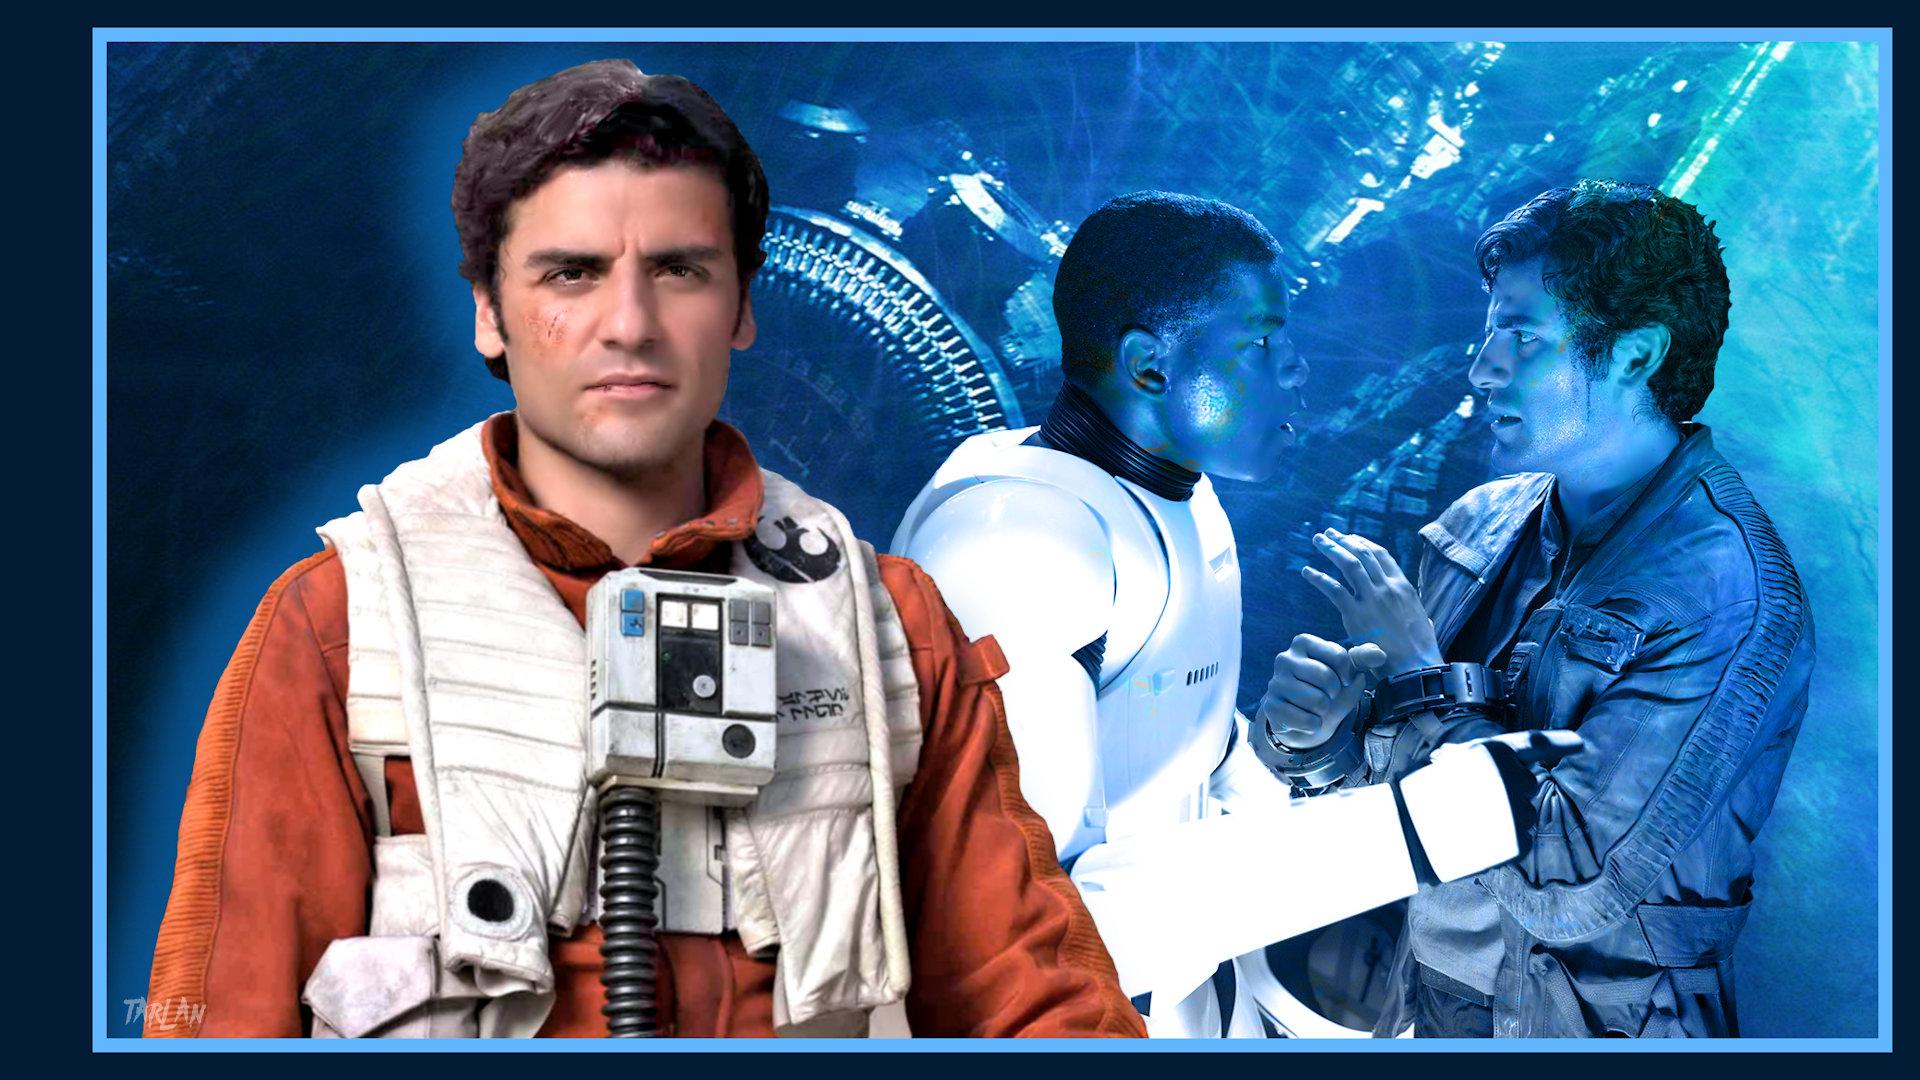 Star Wars - Poe and Finn by Tarlan